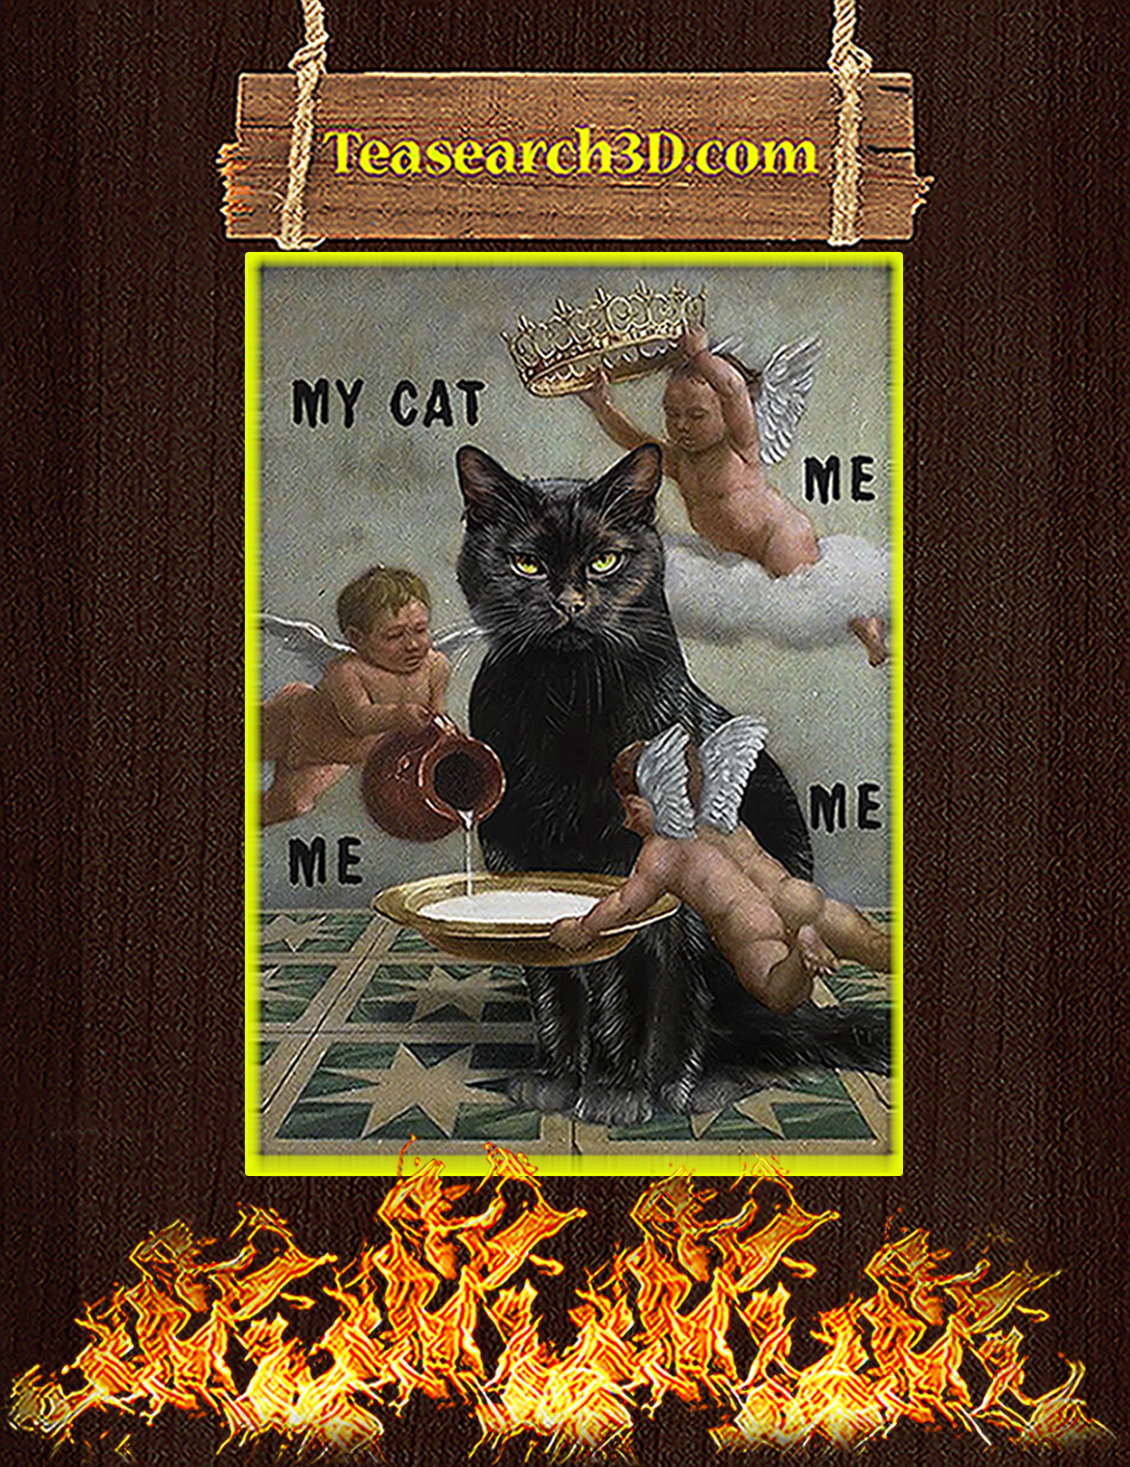 Black cat meme my cat me me me poster A3